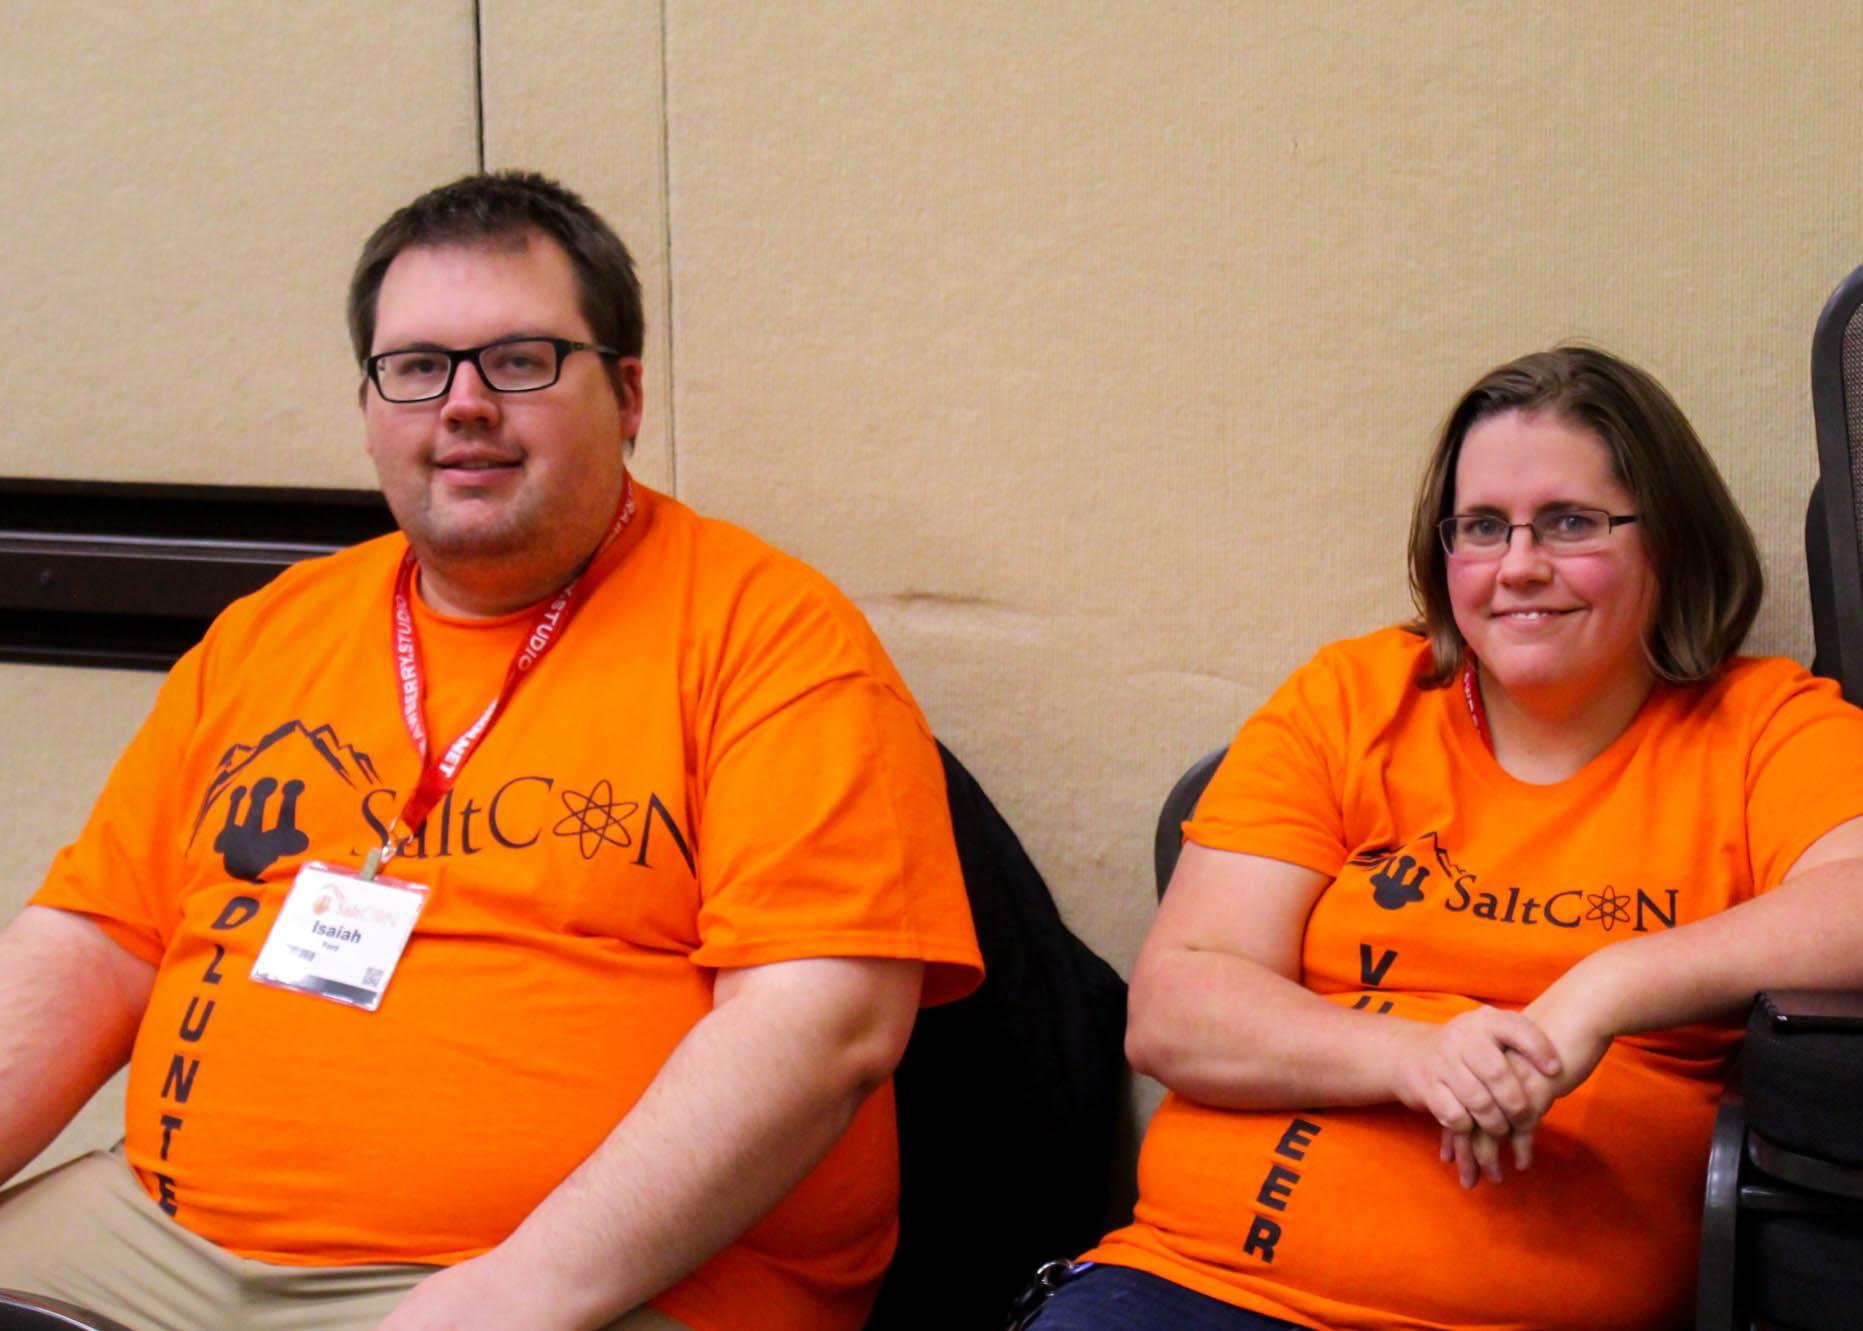 SaltCON Volunteers